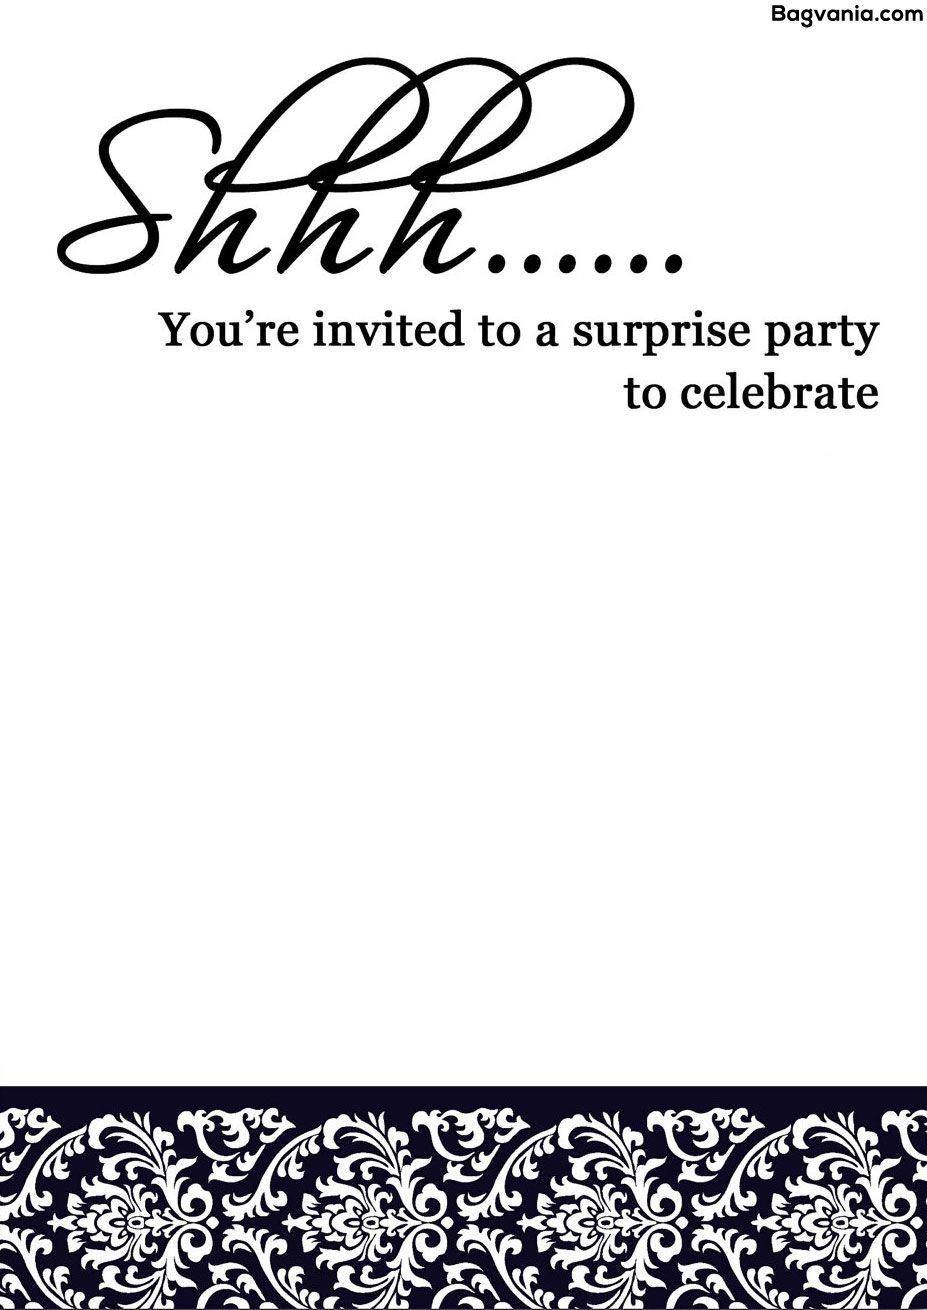 Free Printable Surprise Birthday Invitations – Bagvania Free - Free Printable Surprise Party Invitation Templates